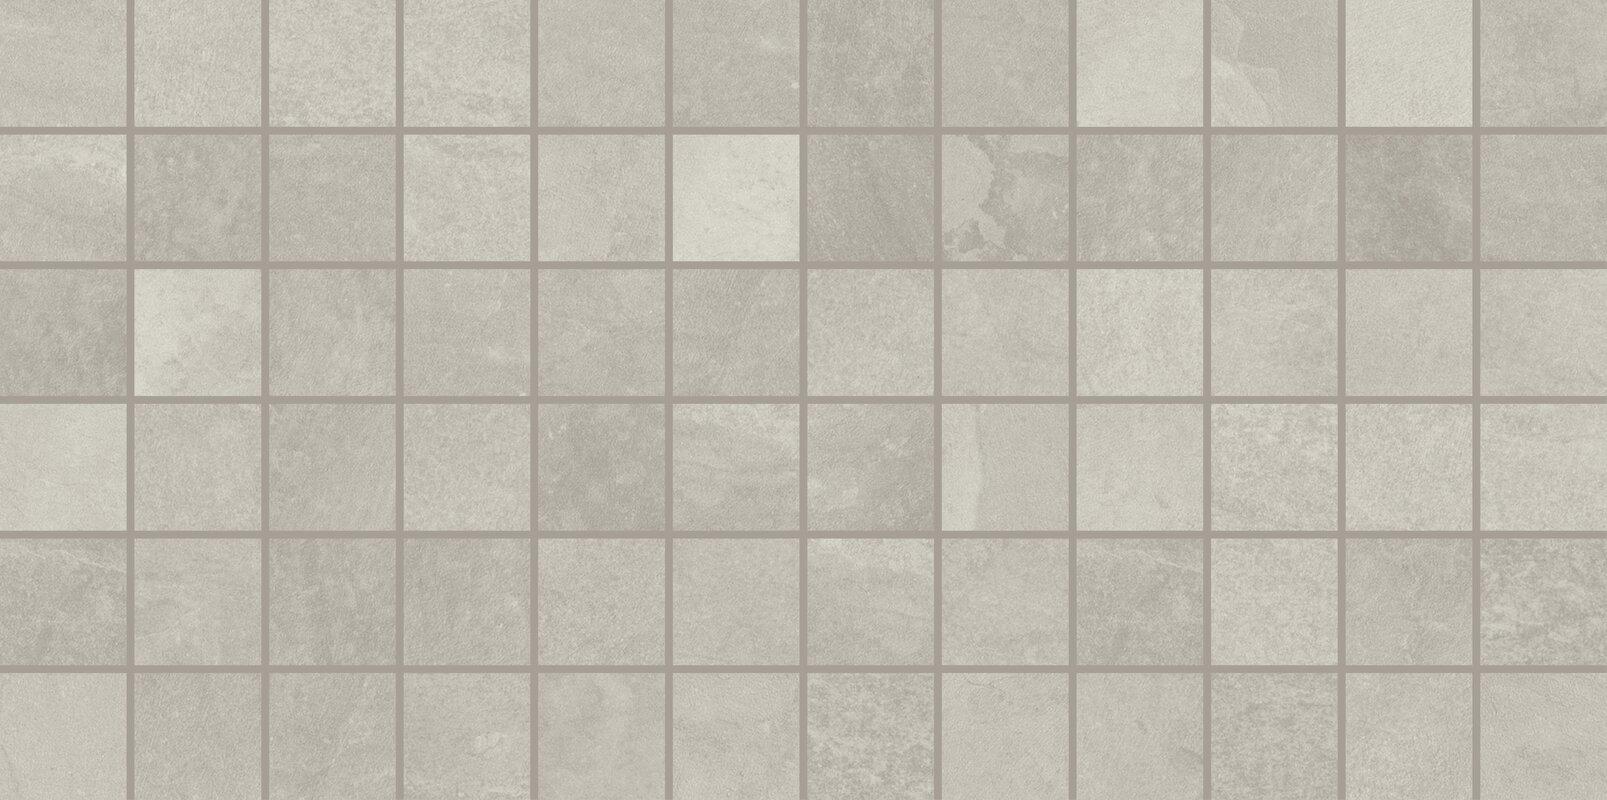 Daltile slate attache 12 x 24 porcelain mosaic tile in meta slate attache 12 x 24 porcelain mosaic tile in meta light gray dailygadgetfo Choice Image